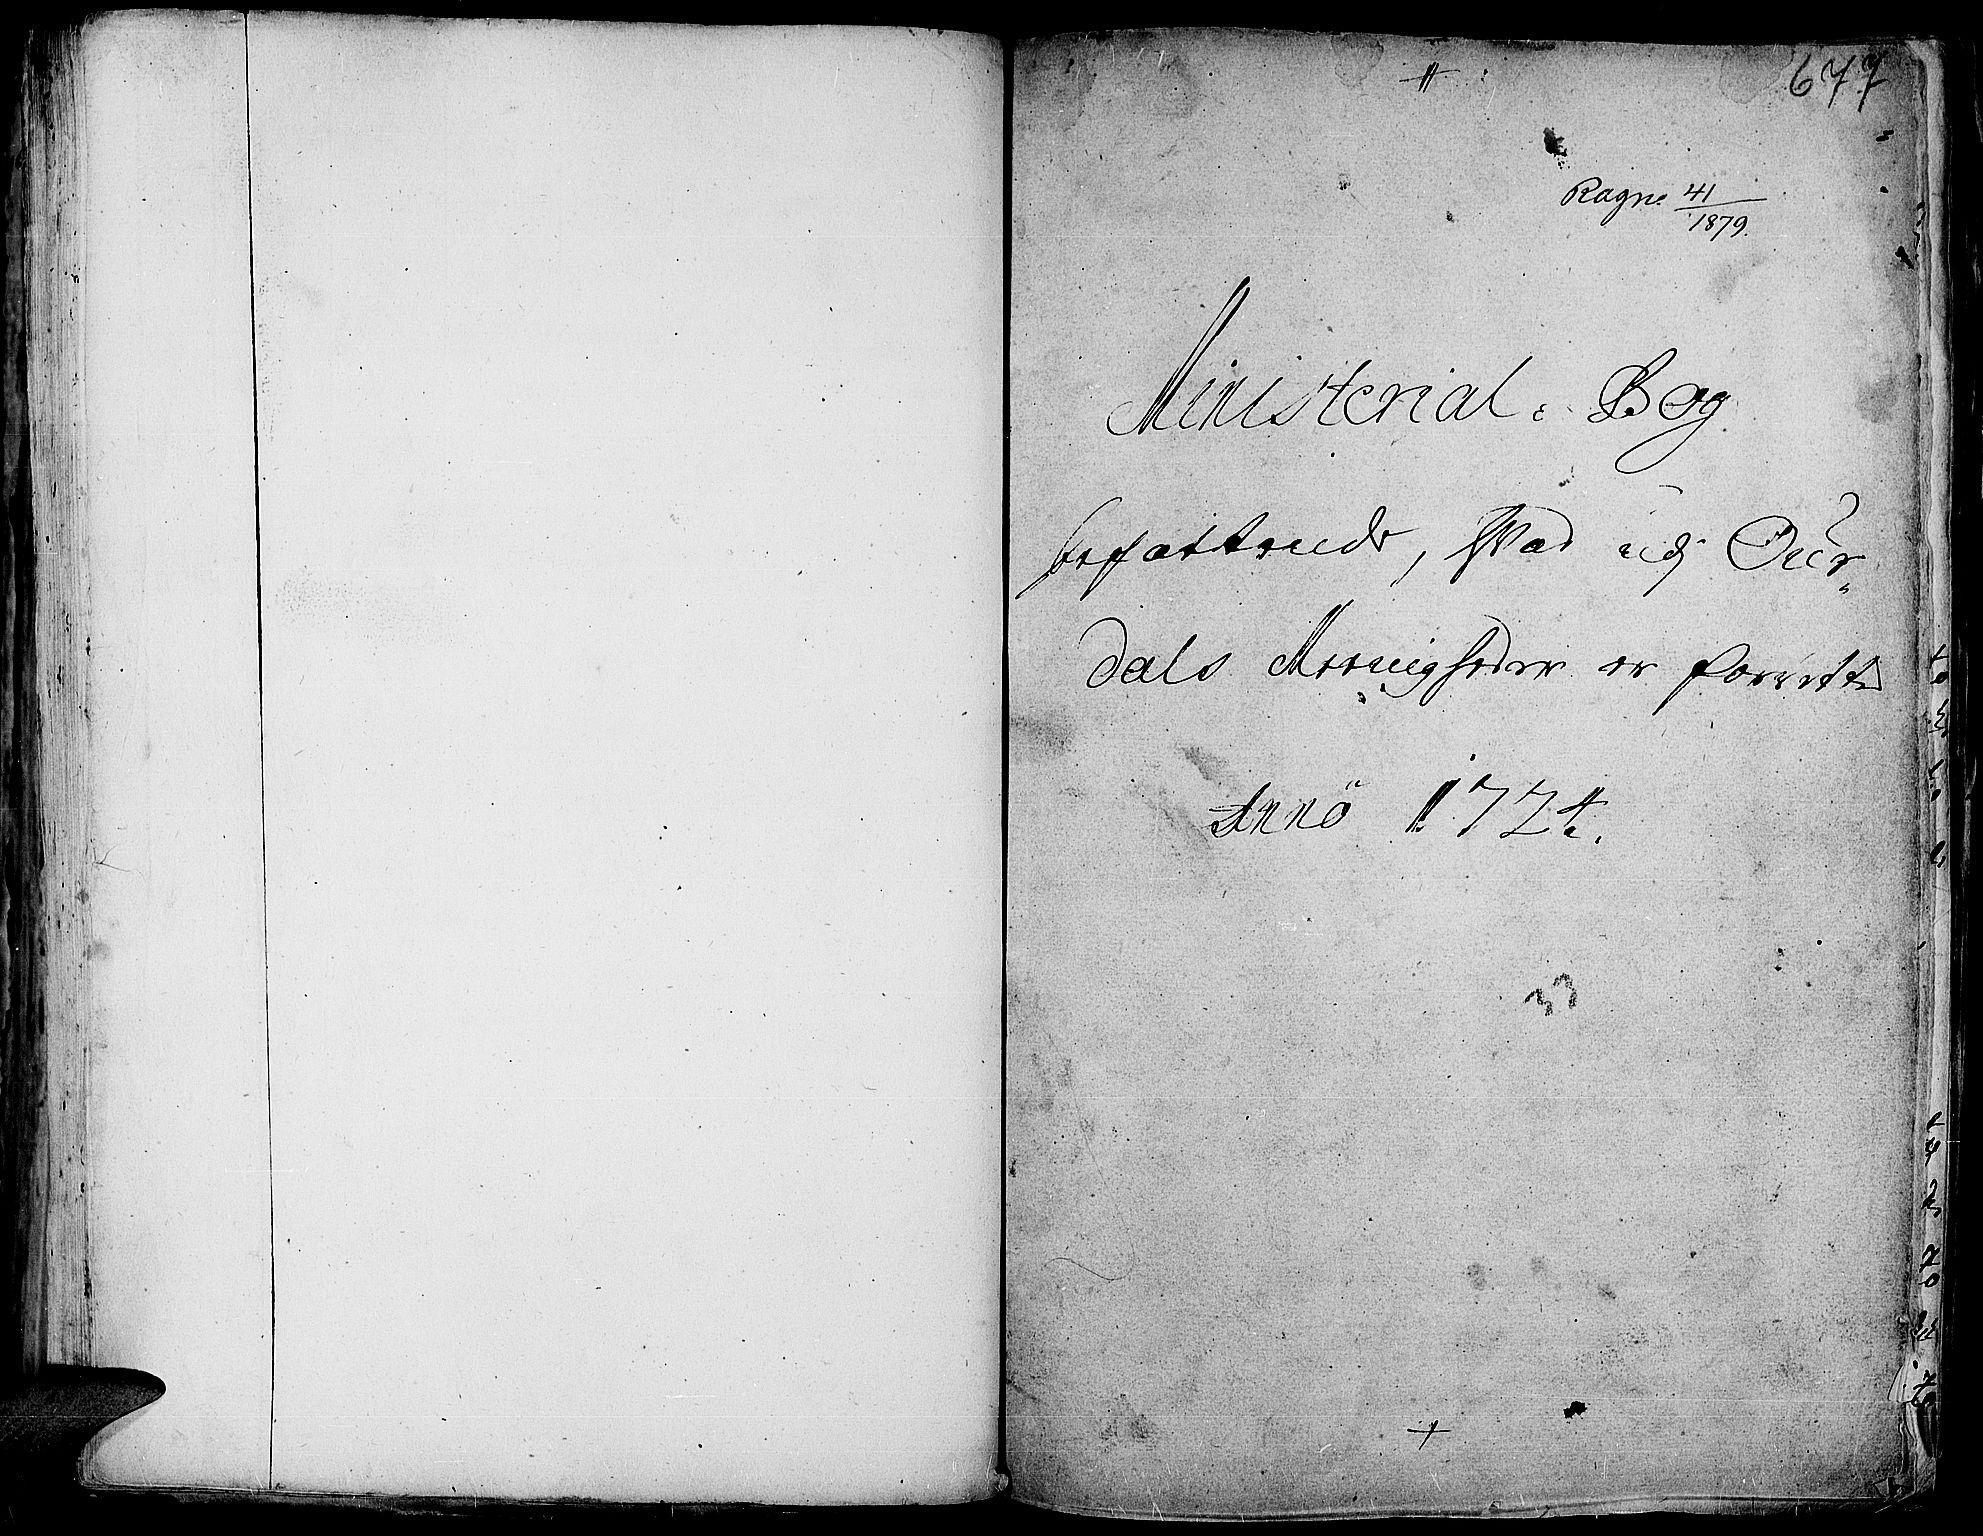 SAH, Aurdal prestekontor, Ministerialbok nr. 1-3, 1692-1730, s. 677